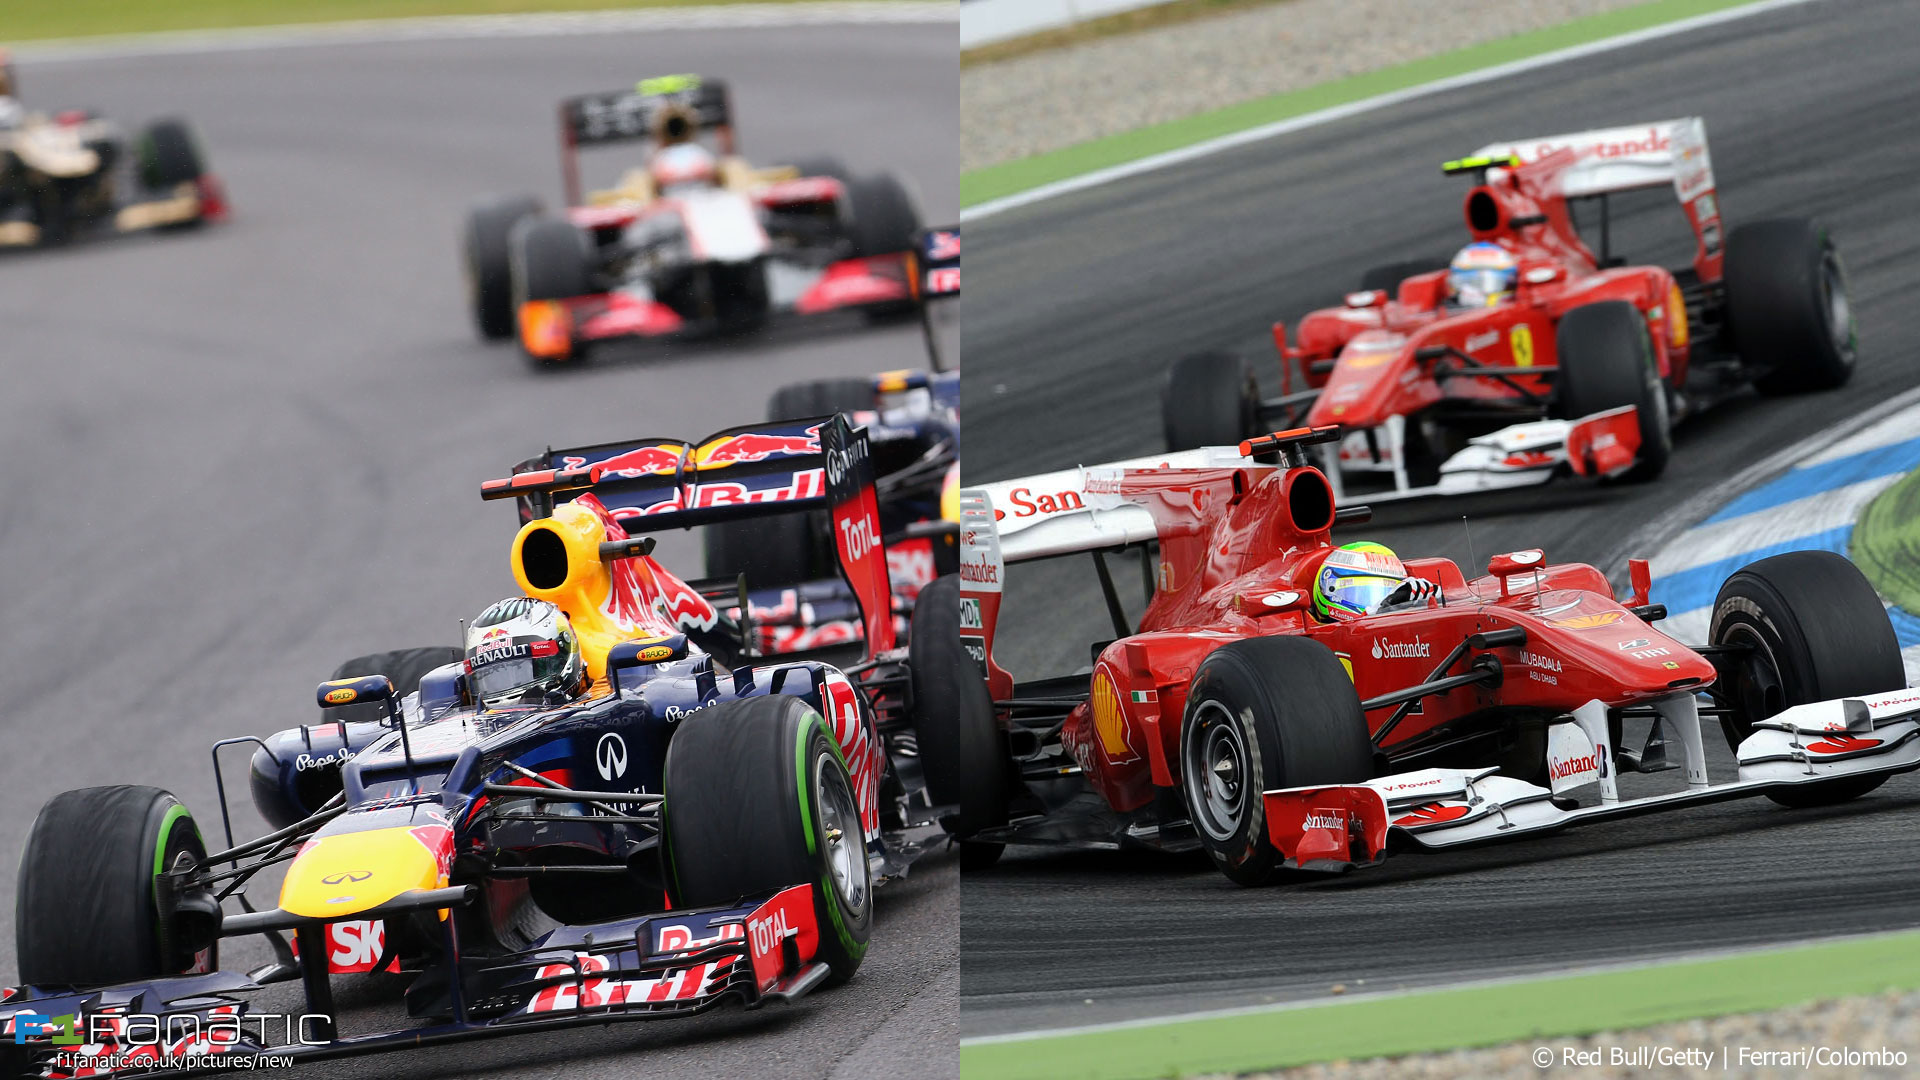 2012 Brazilian and 2010 German Grands Prix